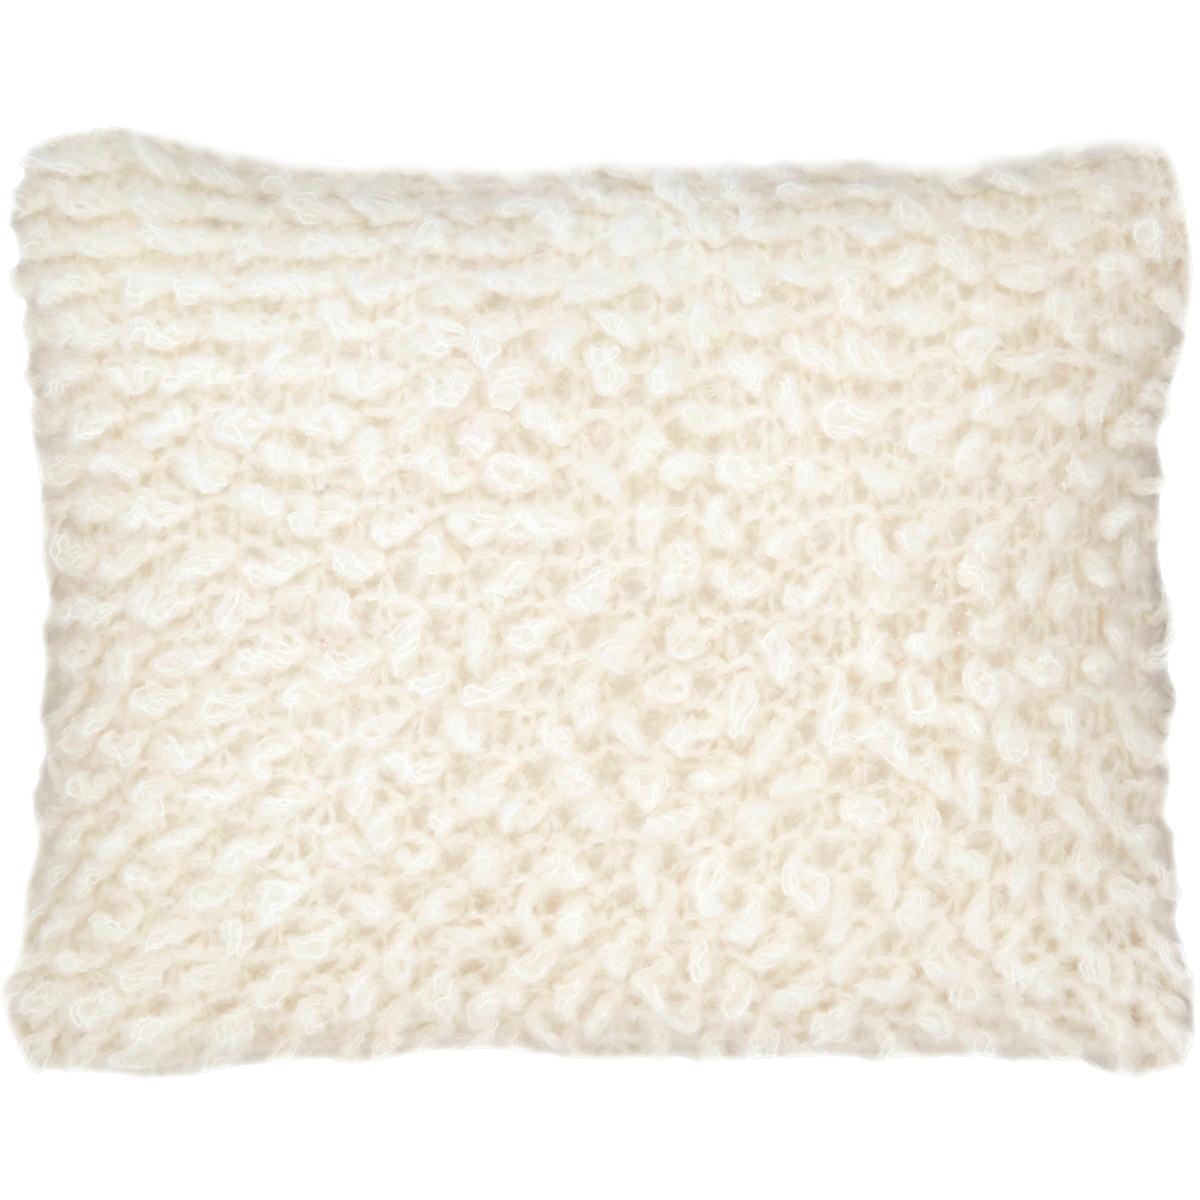 Mara Knit Ivory Decorative Pillow Pine Cone Hill